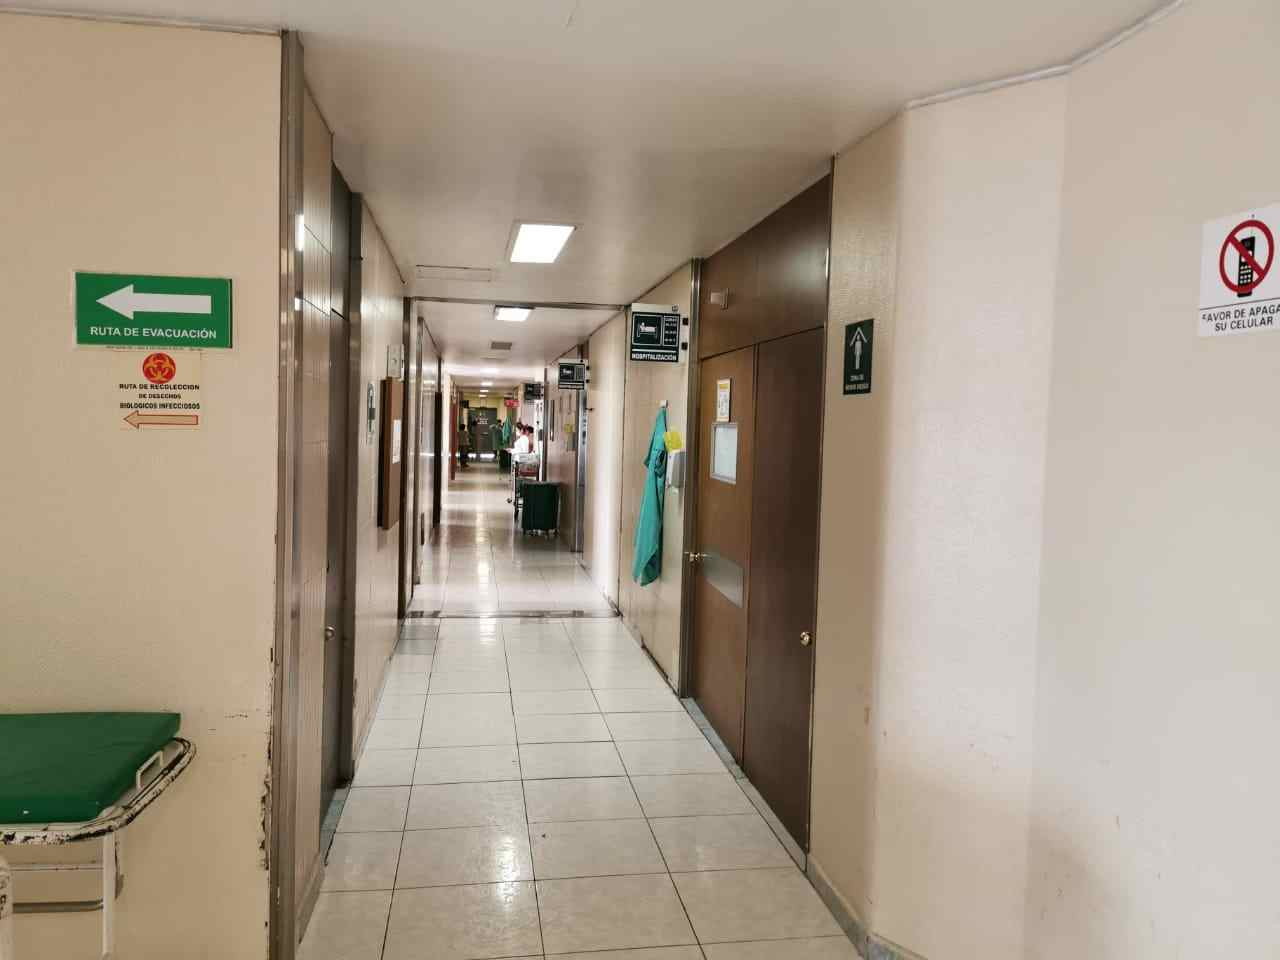 IMSS AUMENTA NÚMERO DE CAMAS EN HOSPITAL DE ORIZABA